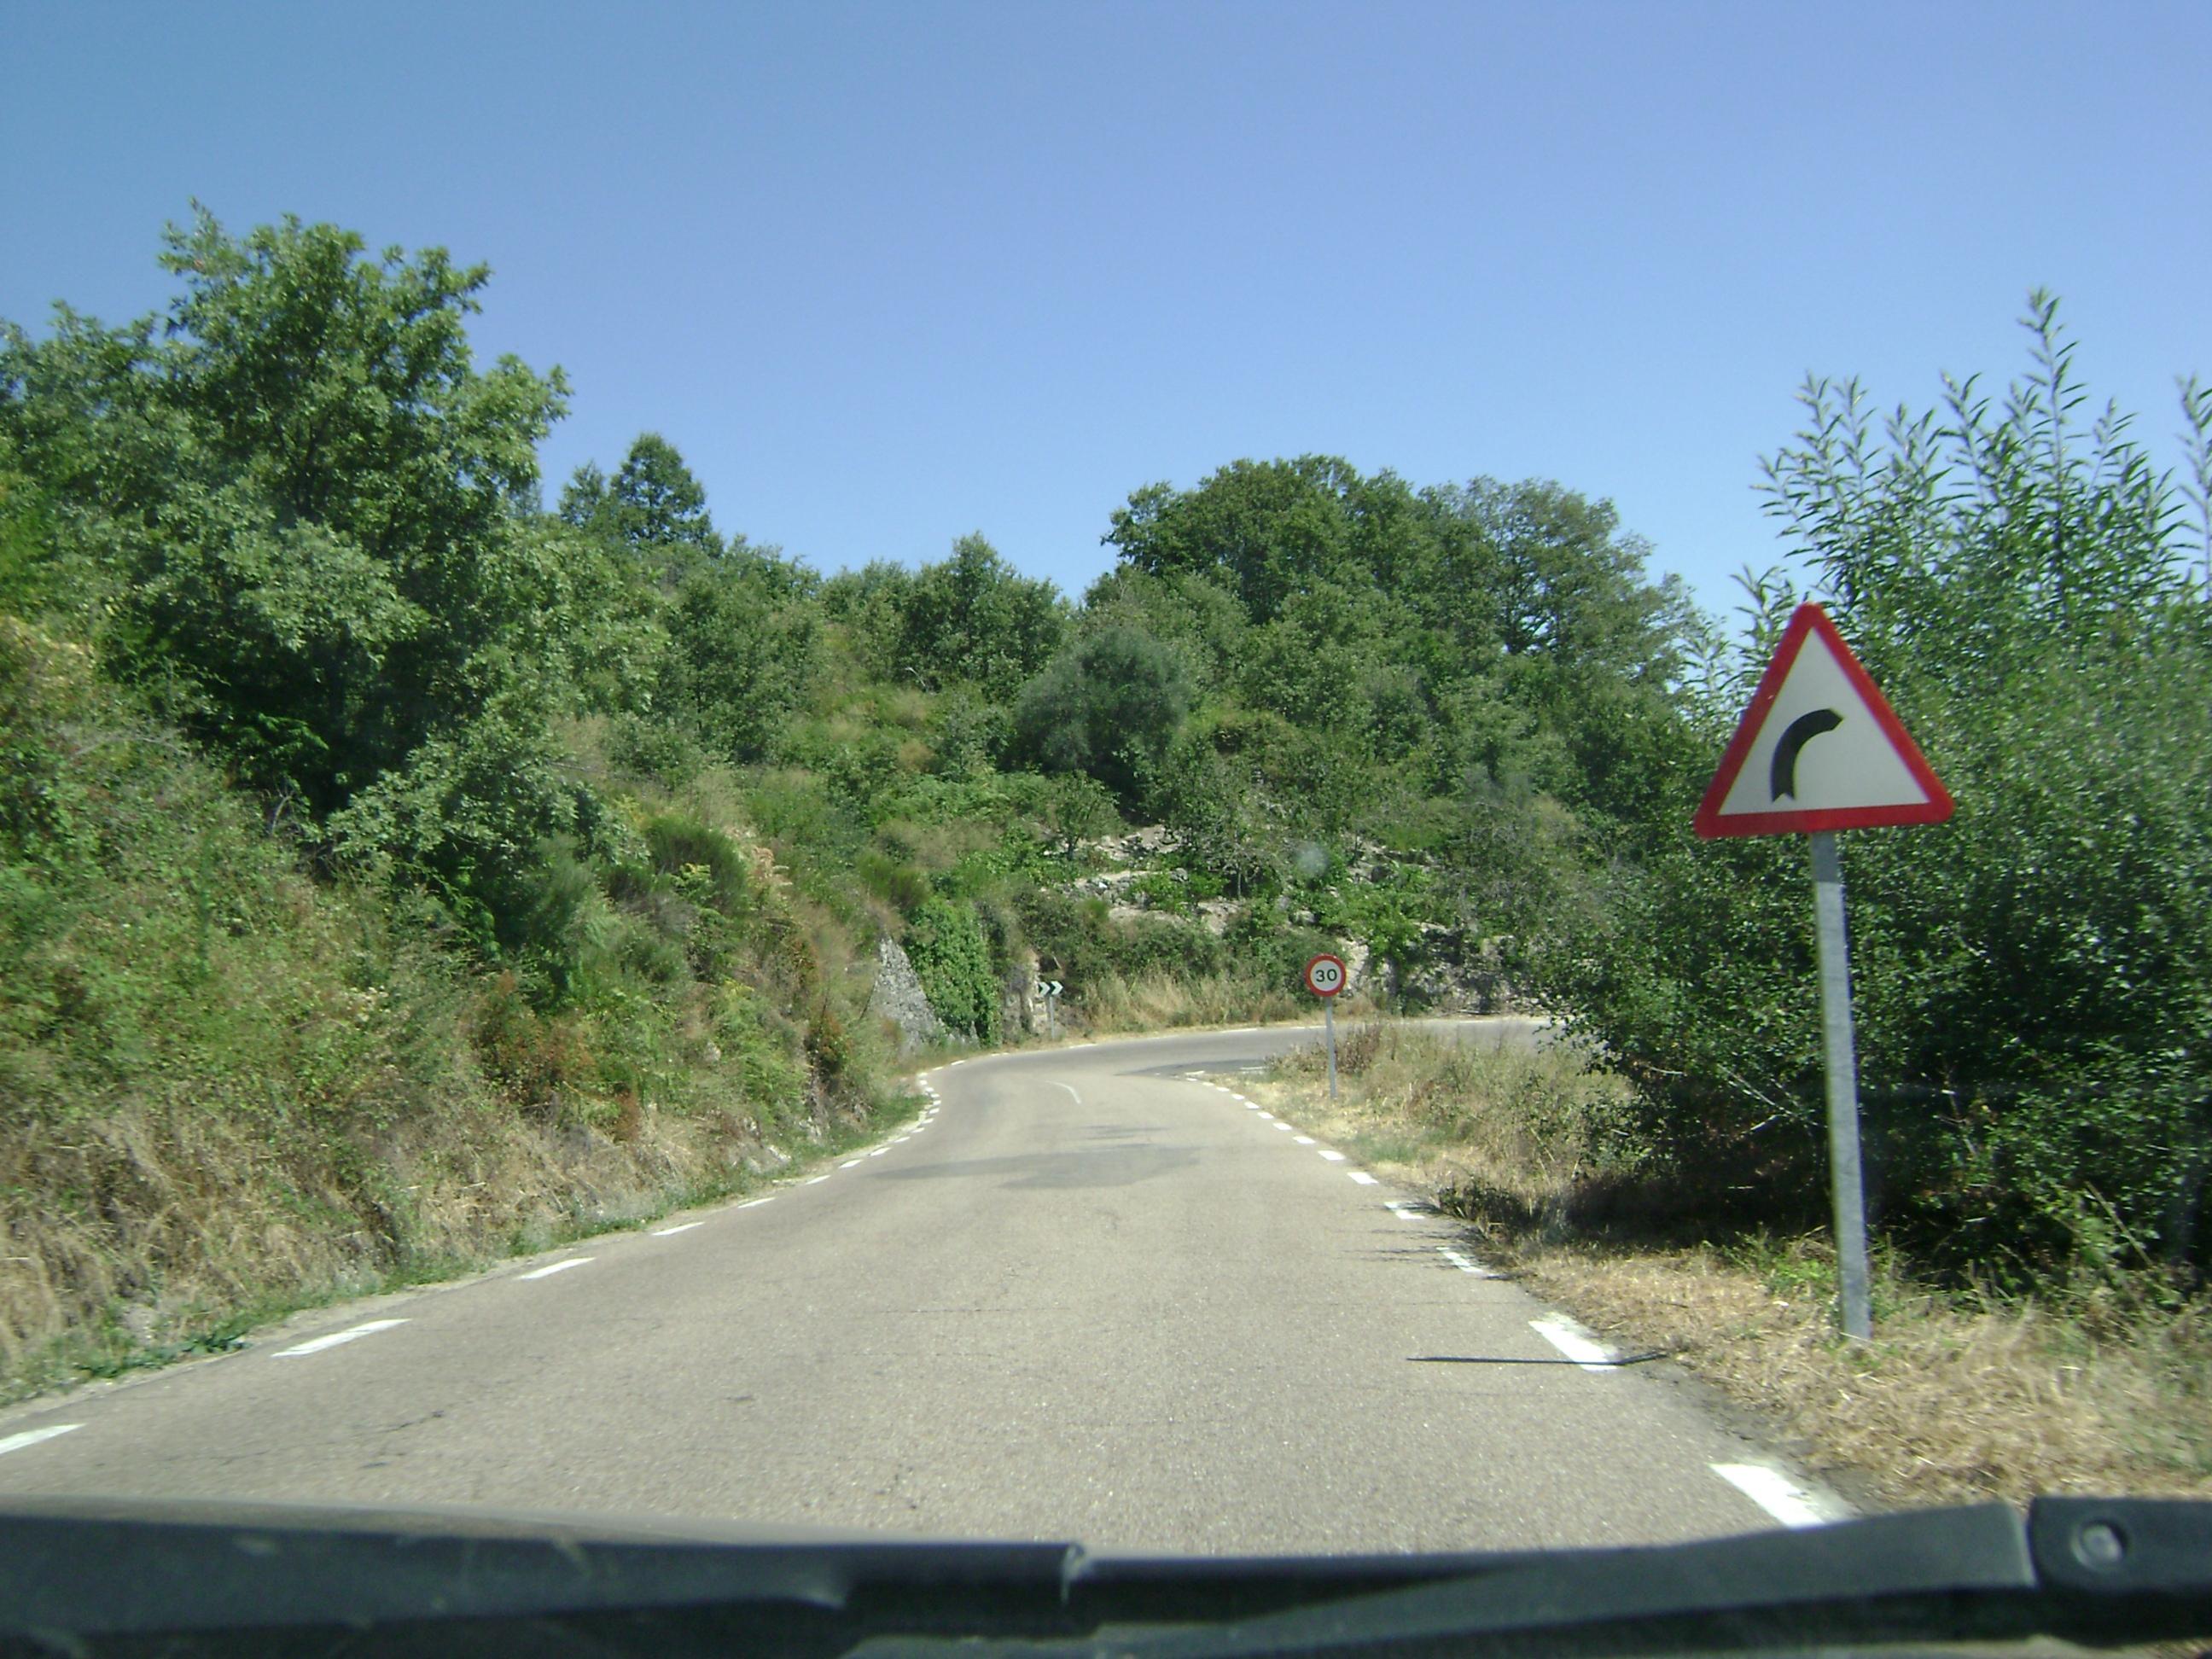 Carretera de La Alberca-Mogarraz, viaje por las hurde